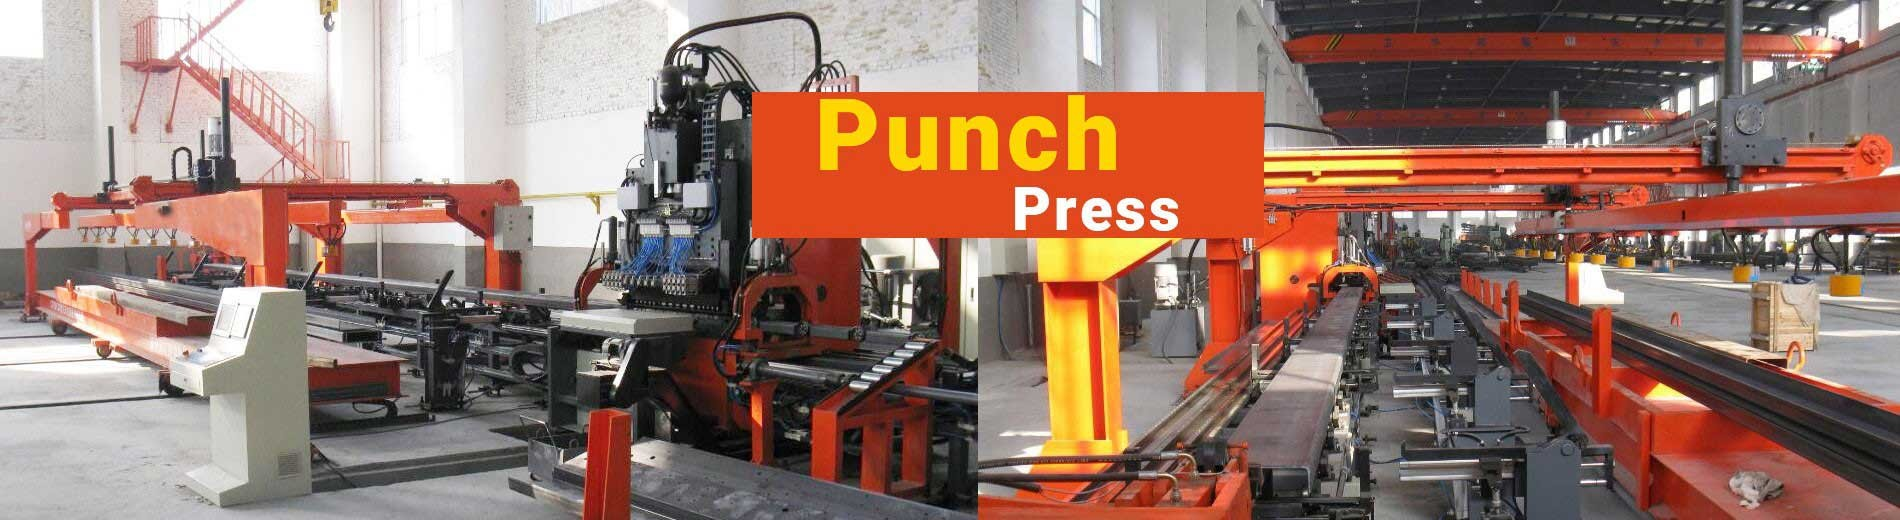 Hydraulic Punching Machine Price, Hydraulic Punching Machine, Hydraulic Press Punching Machine